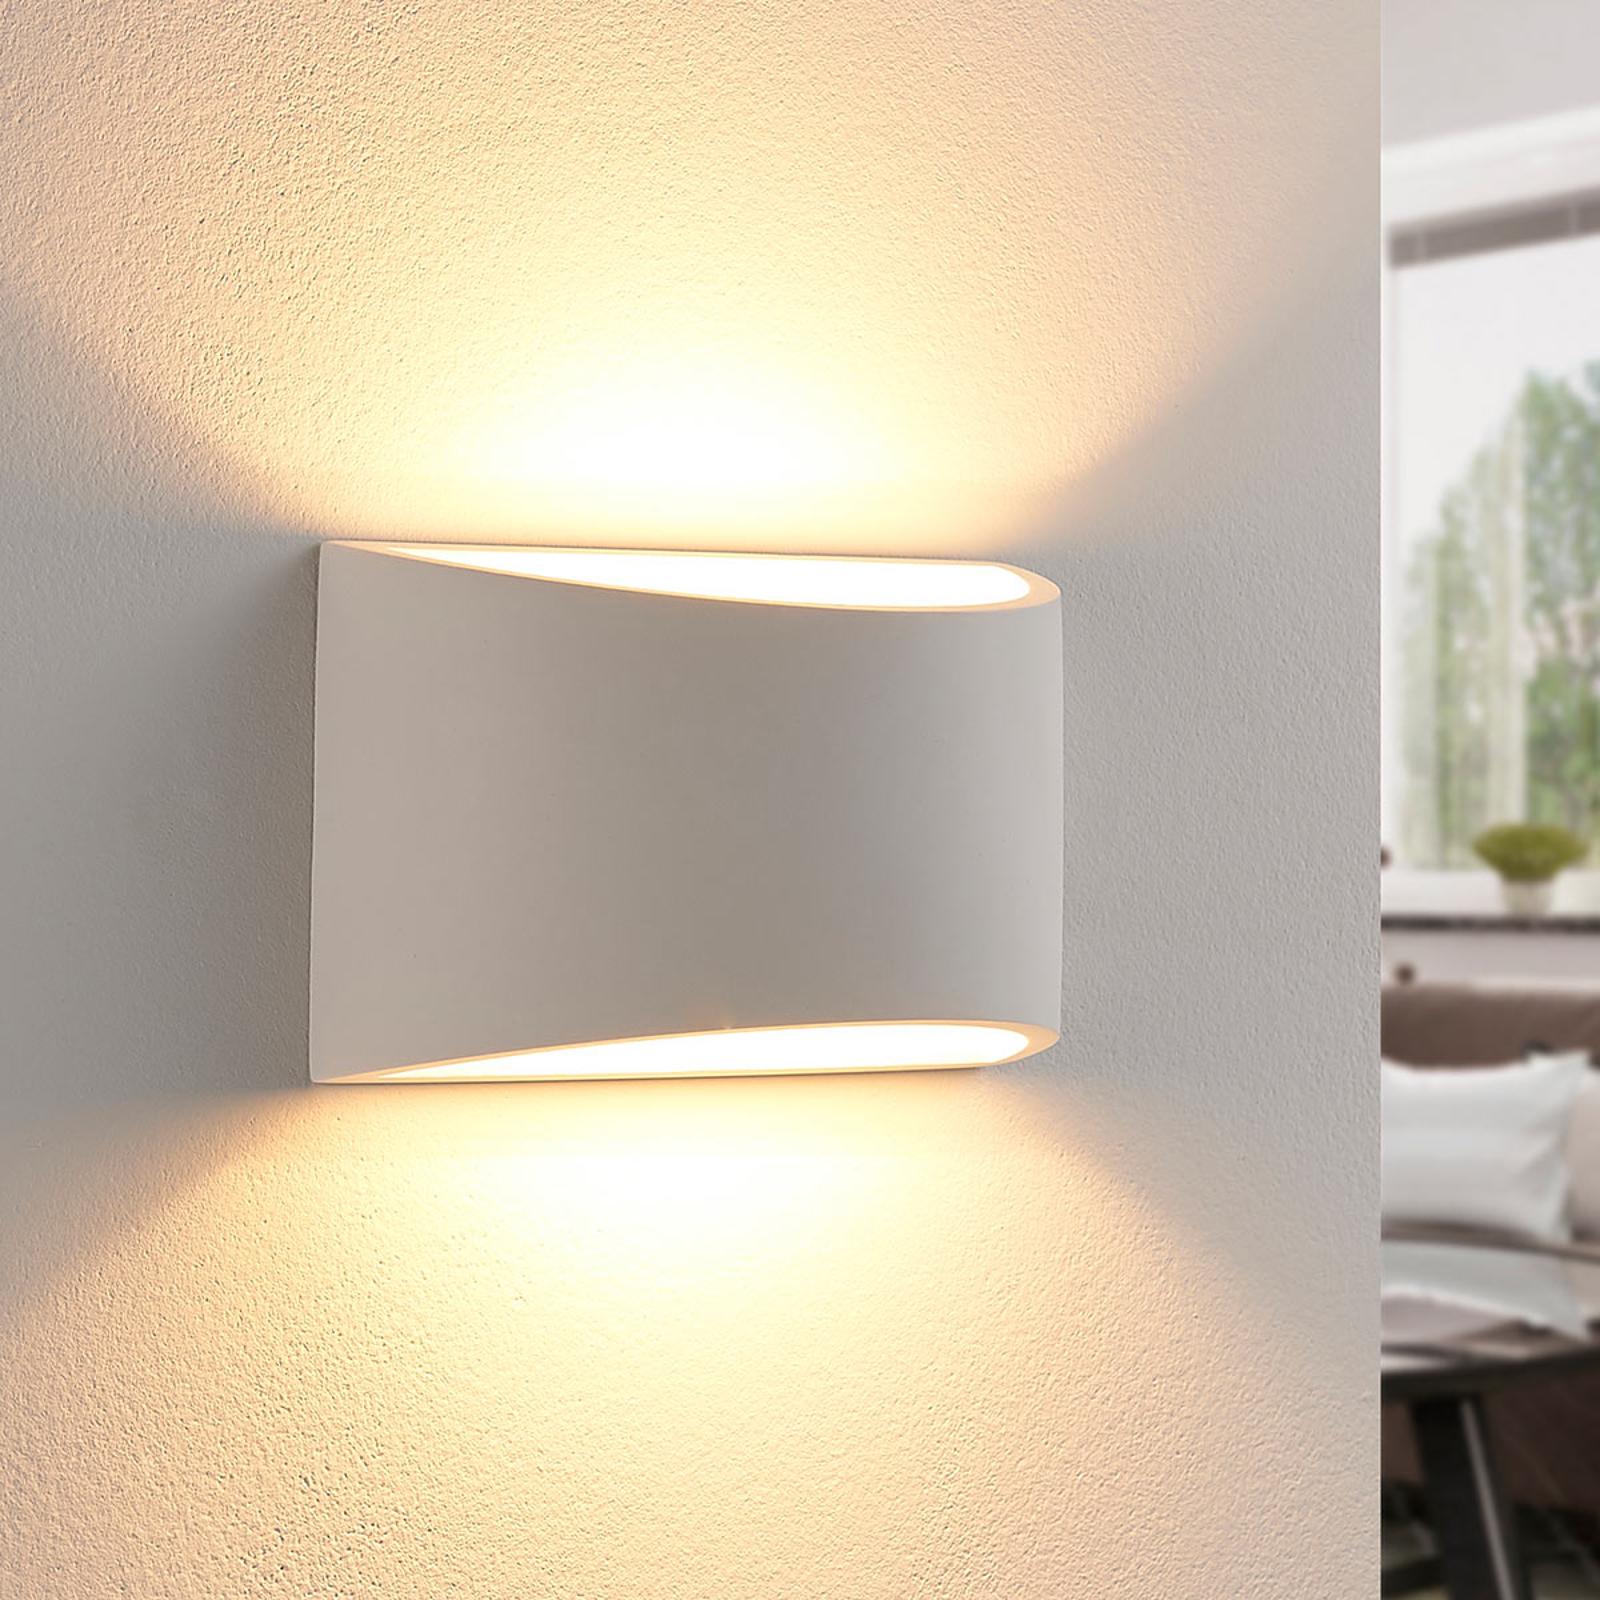 Mooie LED wandlamp Heiko van gips